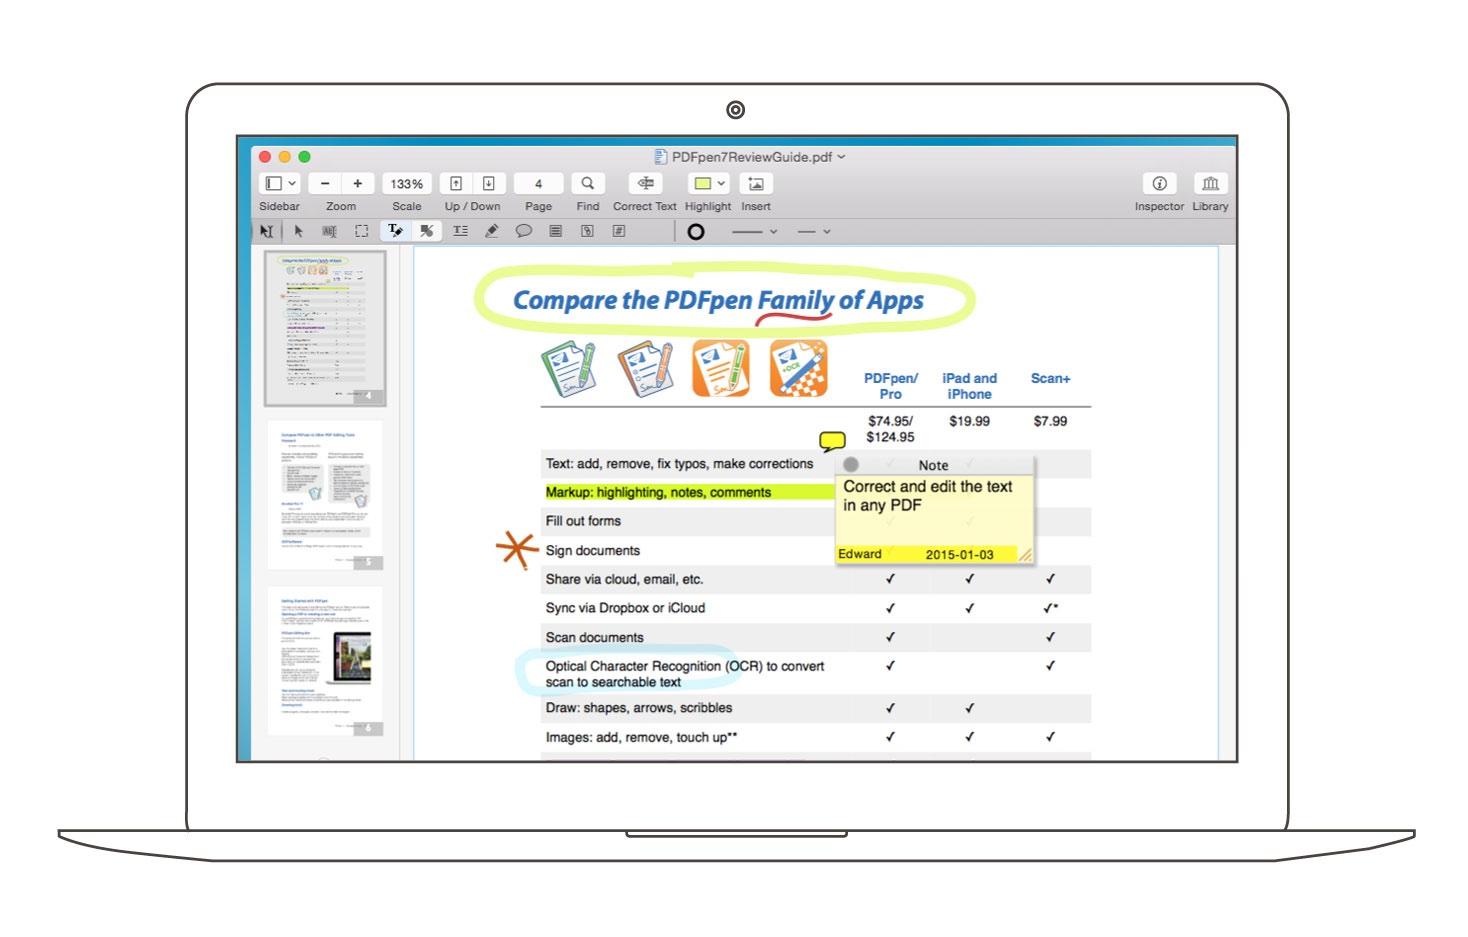 PDFpen 10.1 improves filling forms, link visibility, AppleScript